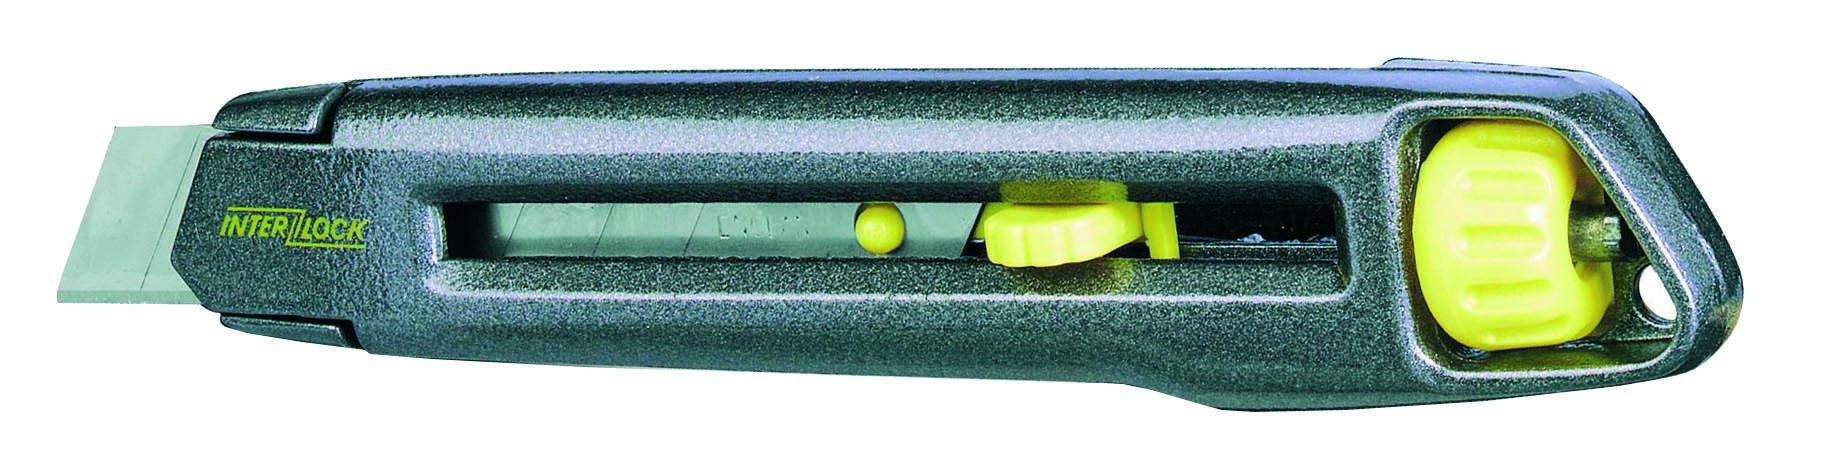 Cutter Interlock 165 x 18 mm